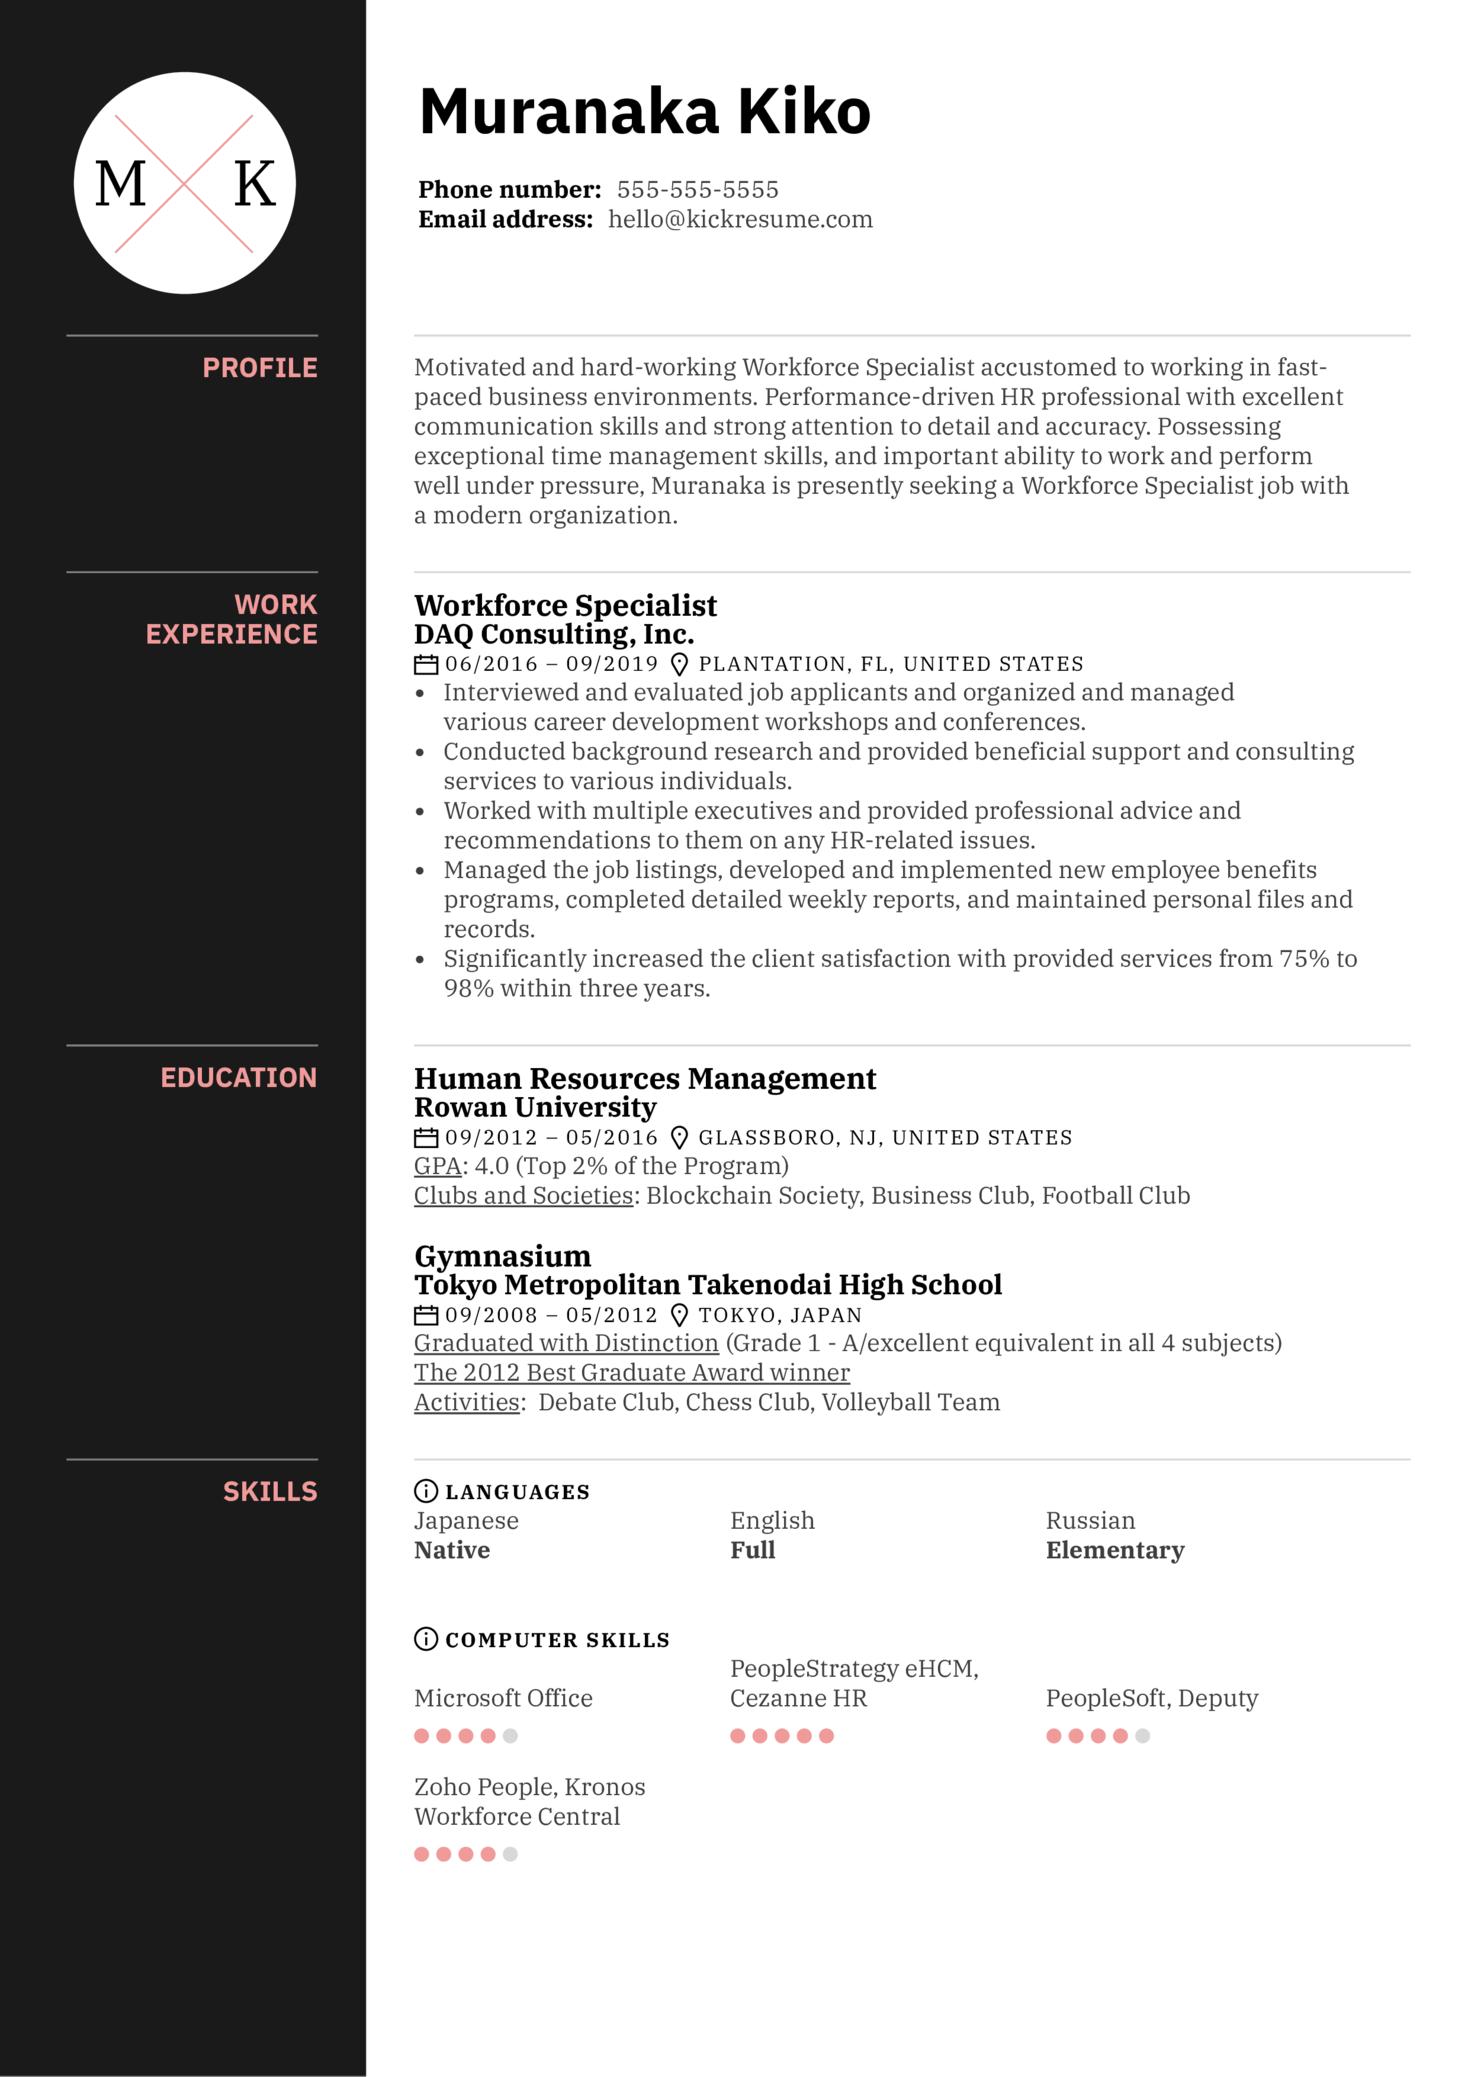 Workforce Specialist Resume Sample (Teil 1)